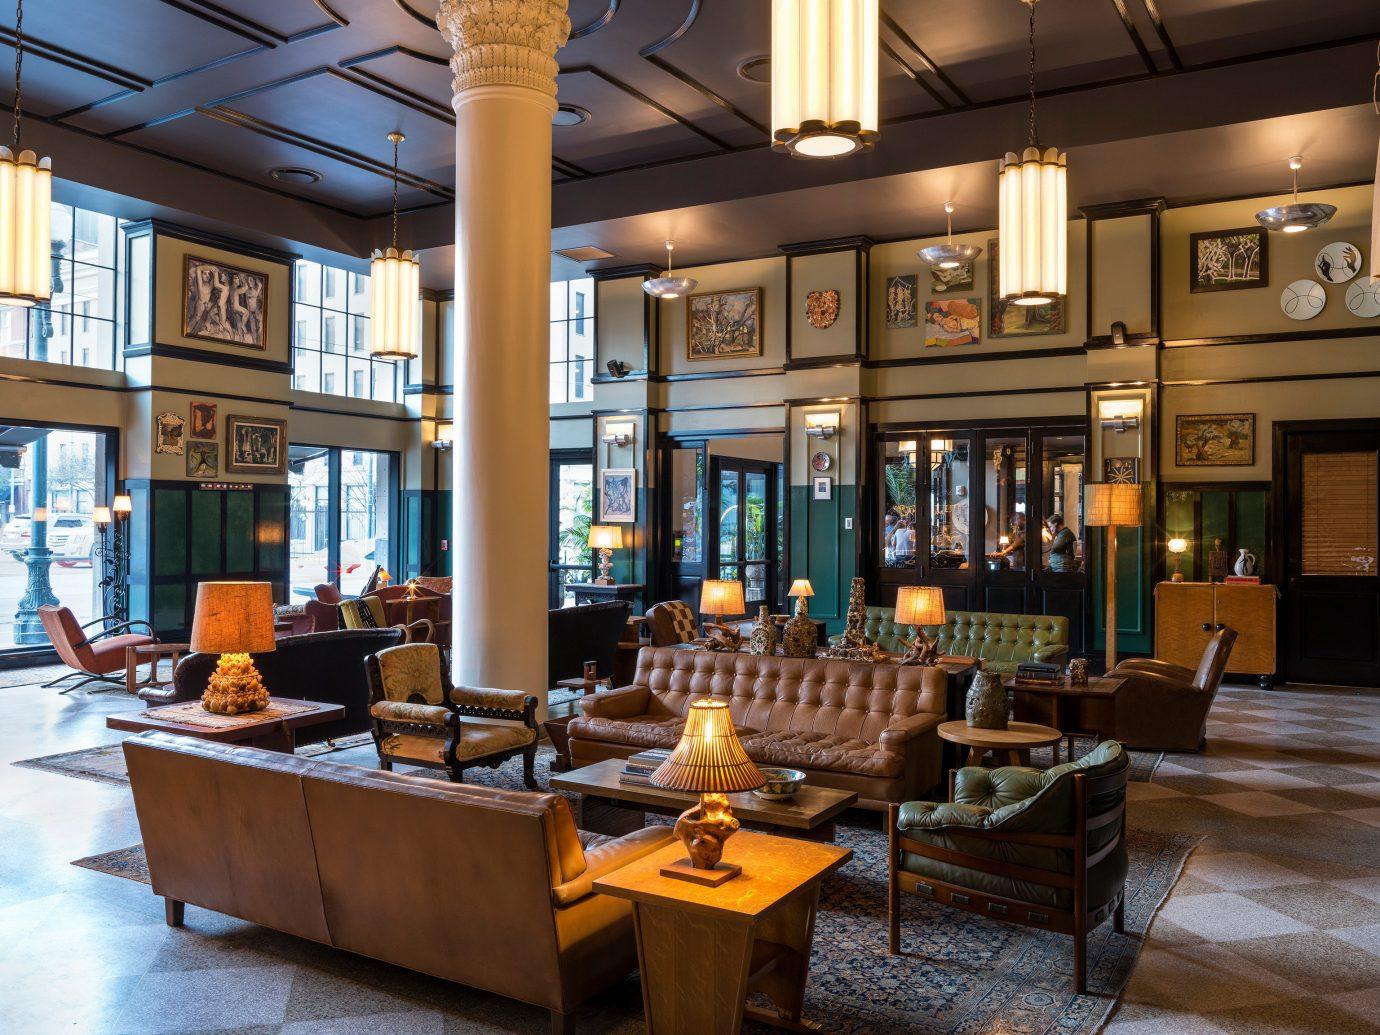 Hotels Offbeat Trip Ideas Weekend Getaways indoor Lobby room estate Bar restaurant interior design café furniture